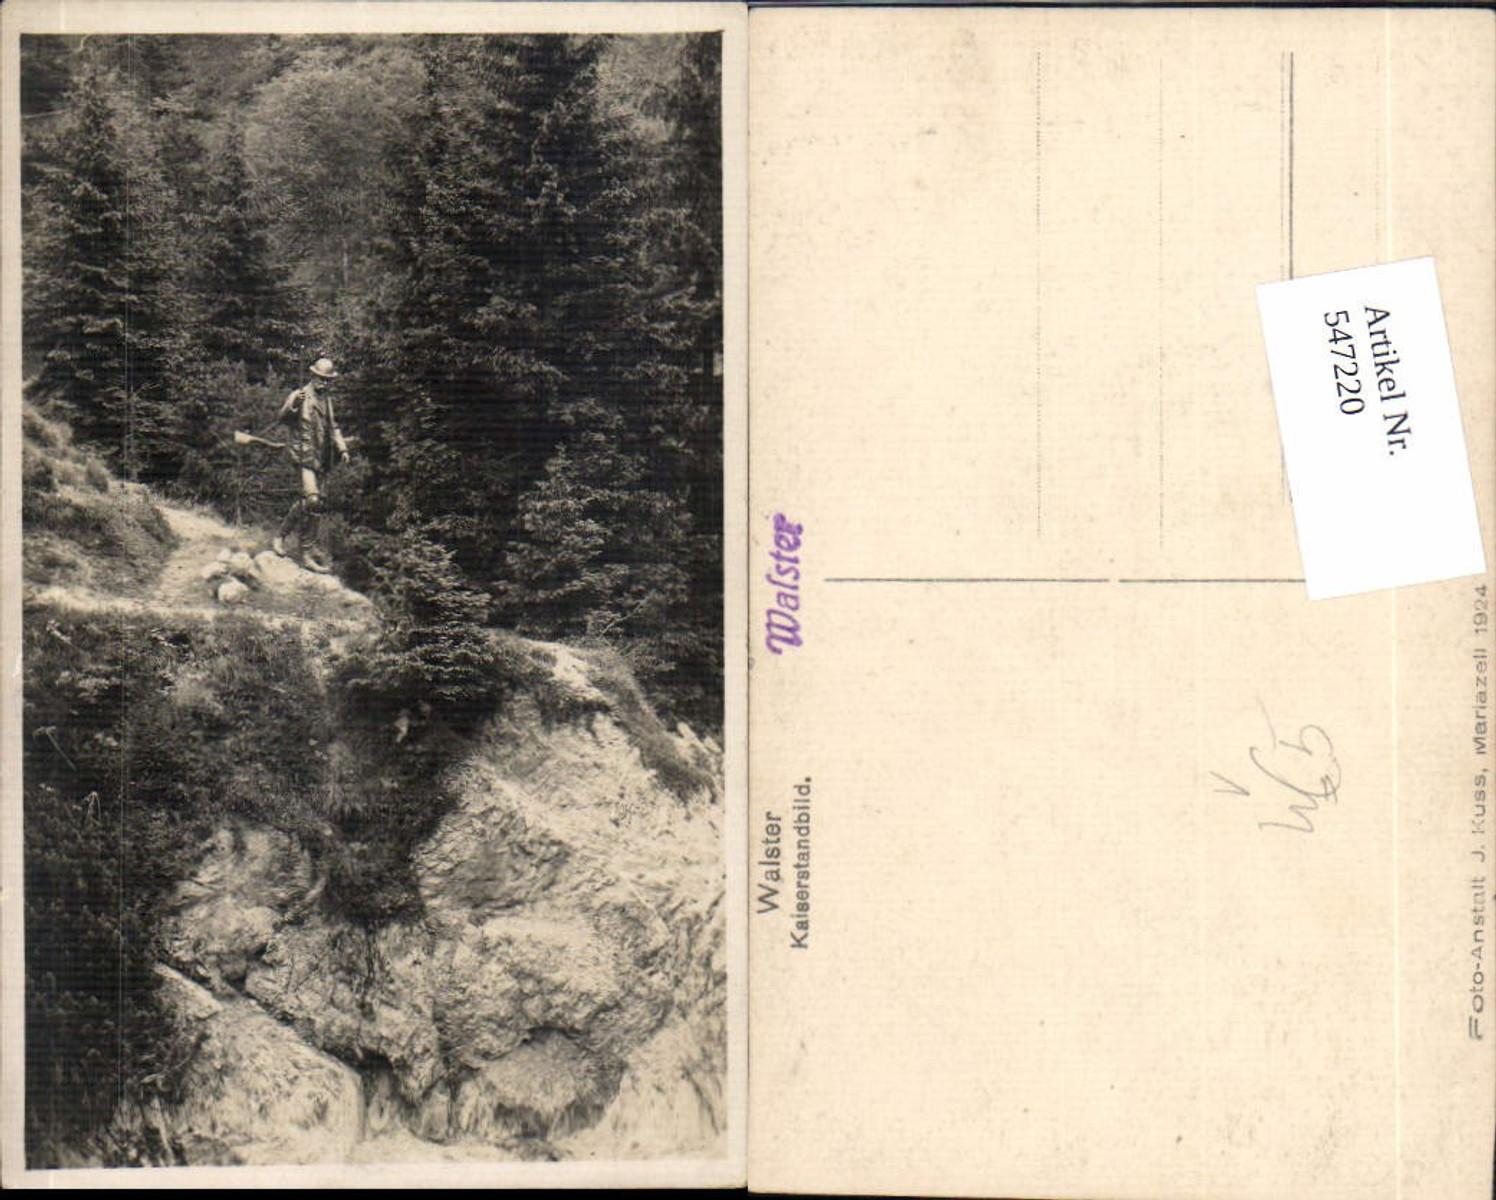 547220,Foto-AK Walster Mariazell Maria Zell Grünau Kaiserstandbild pub Kuss 1924 günstig online kaufen